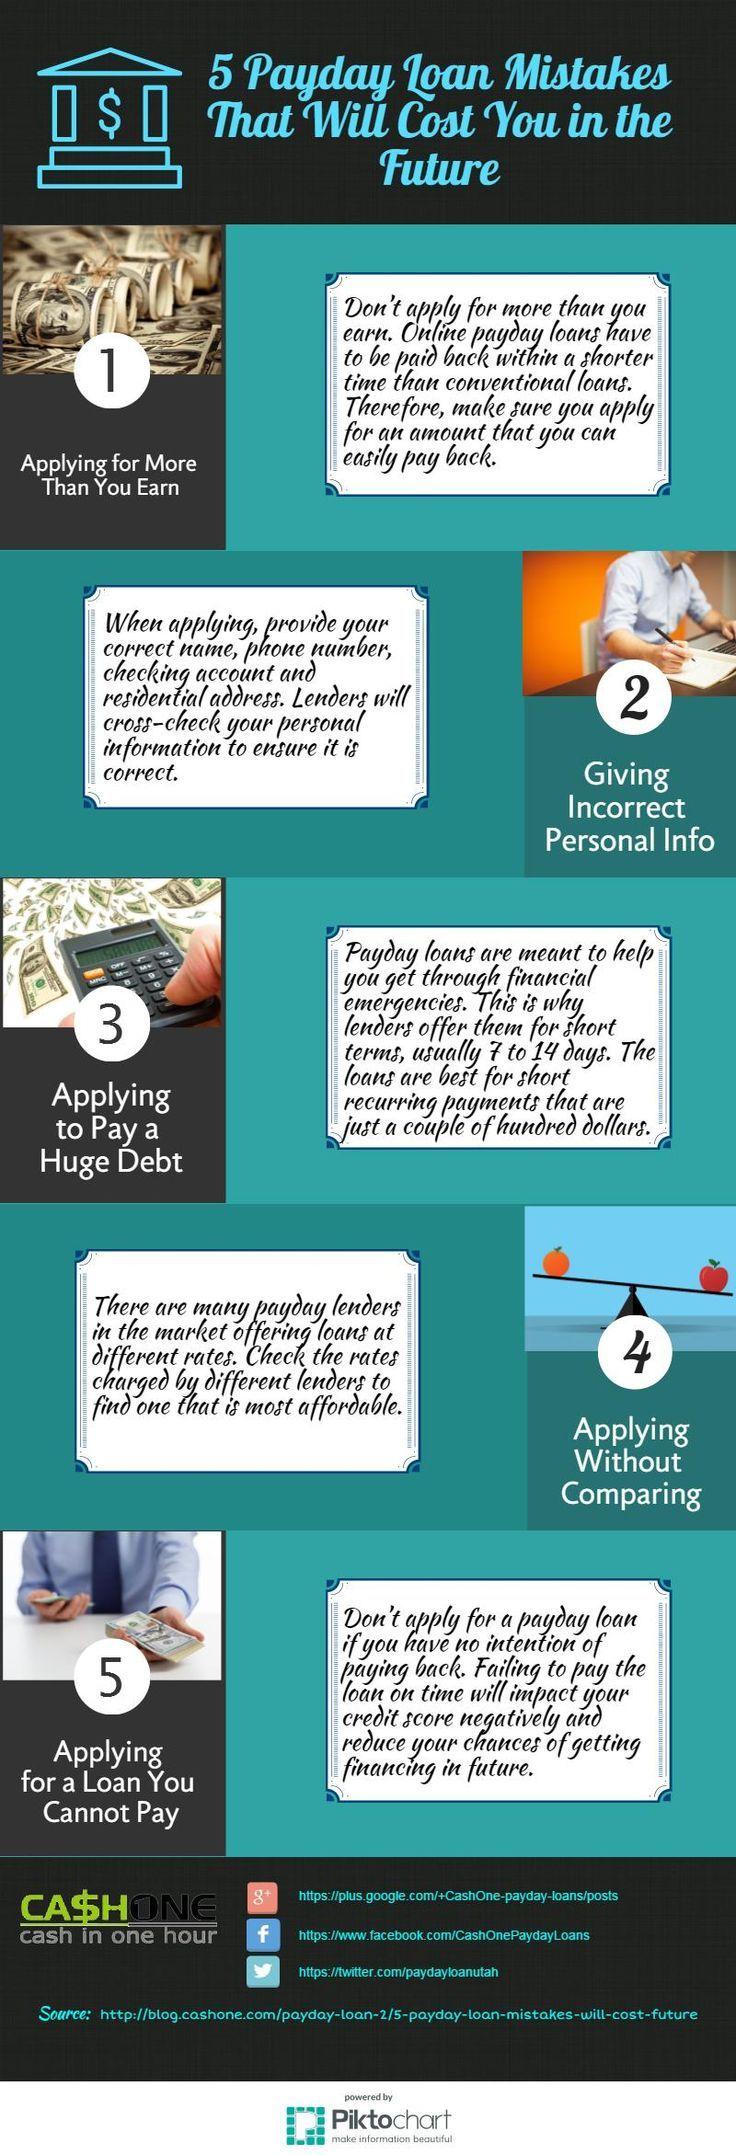 Fast payday loans ohio image 10